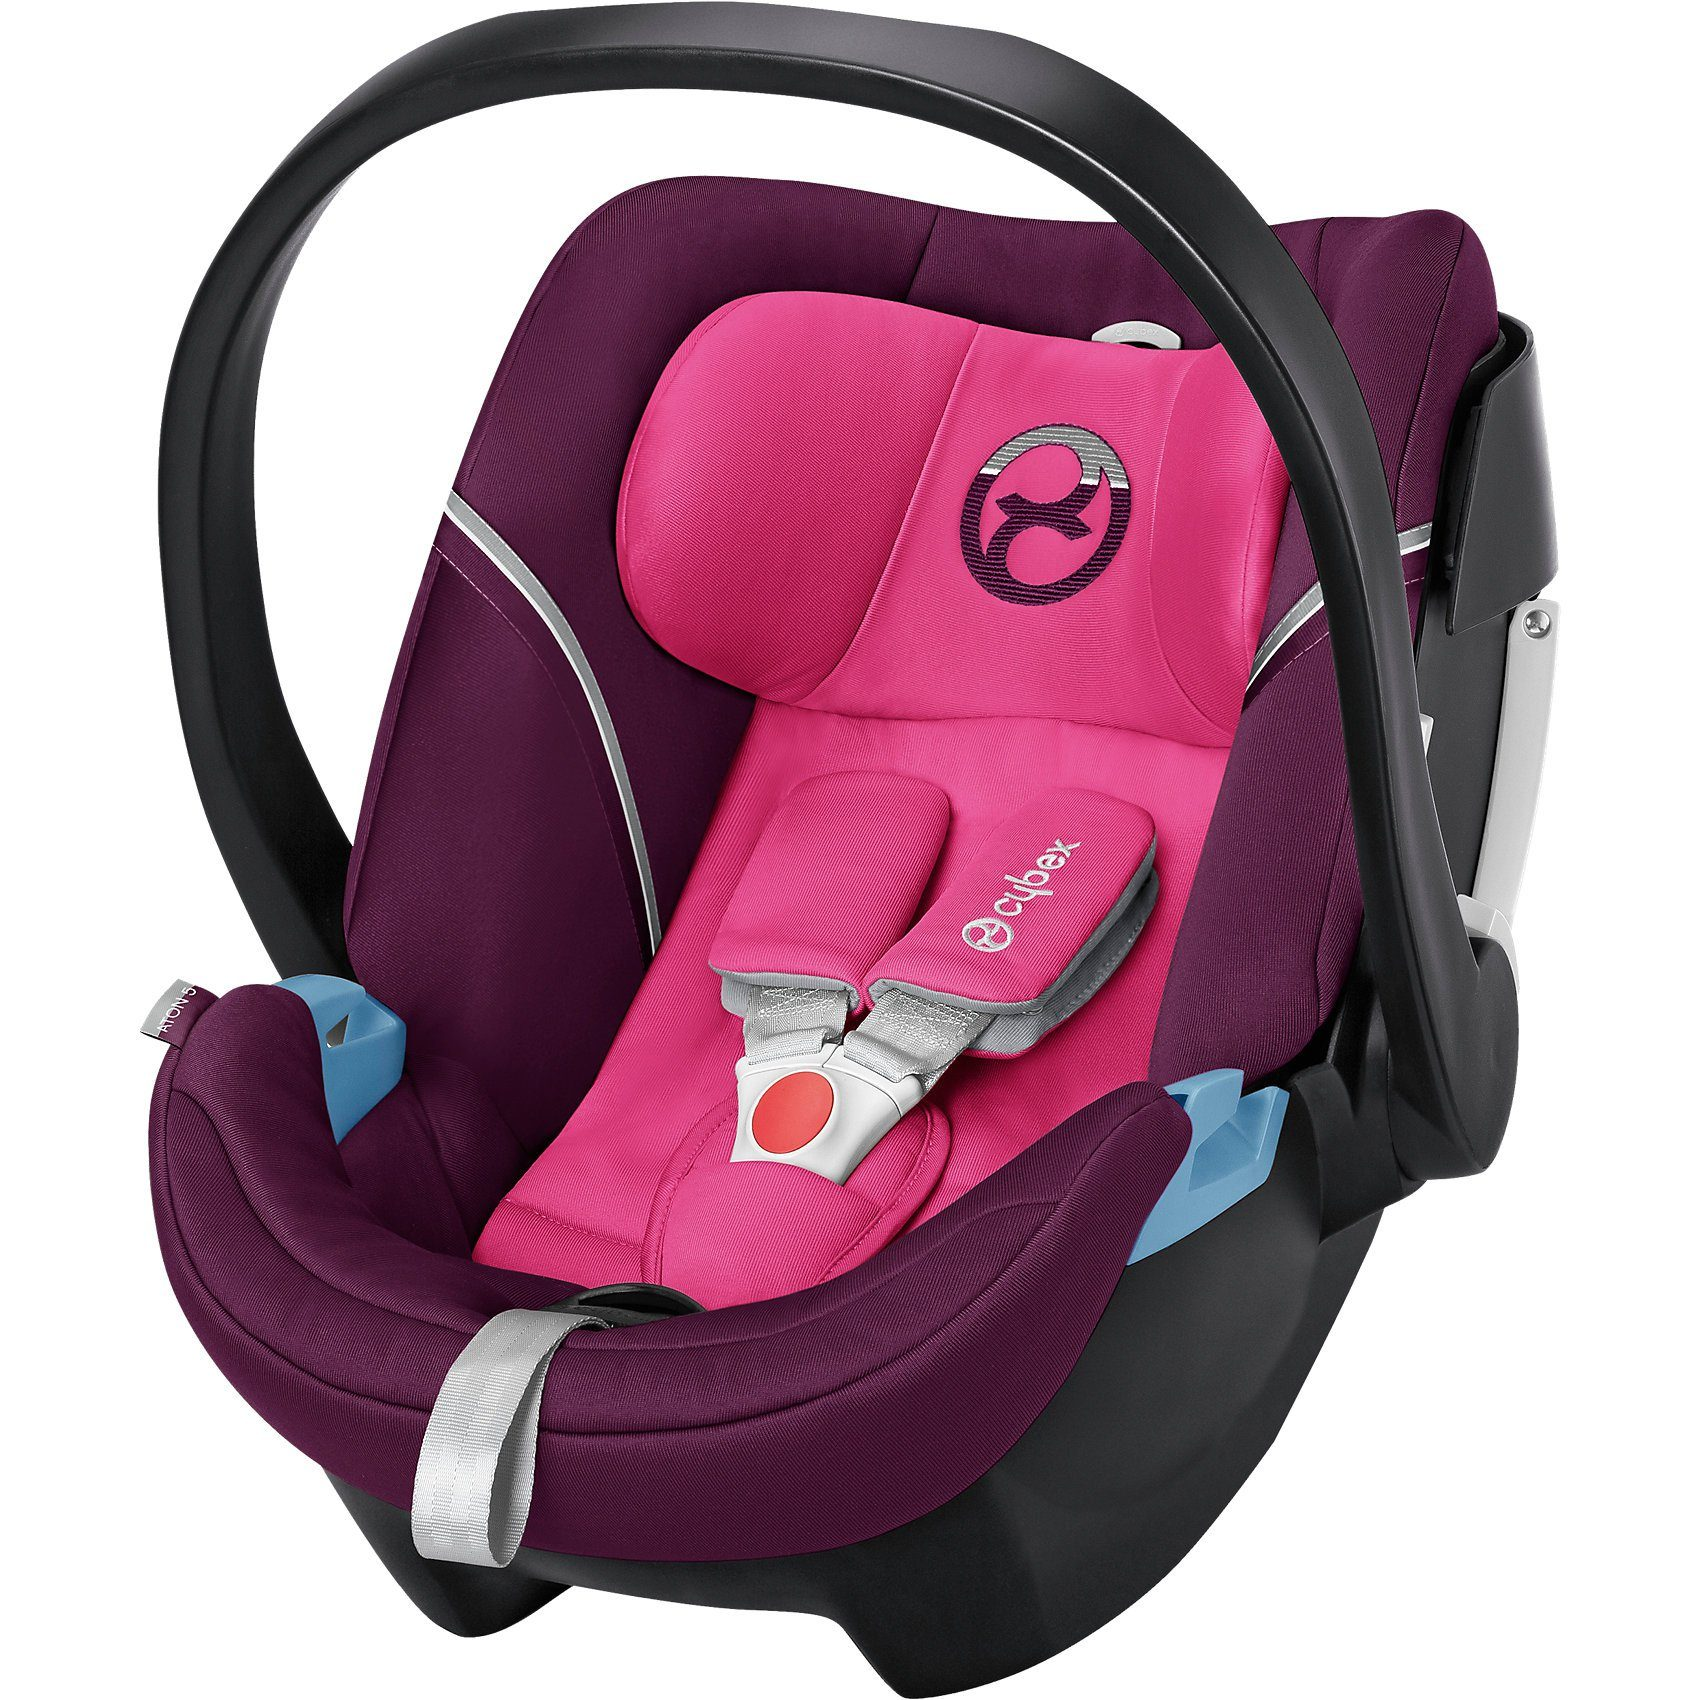 Cybex Babyschale Aton 5, Gold-Line, Mystic Pink-Purple, 2017